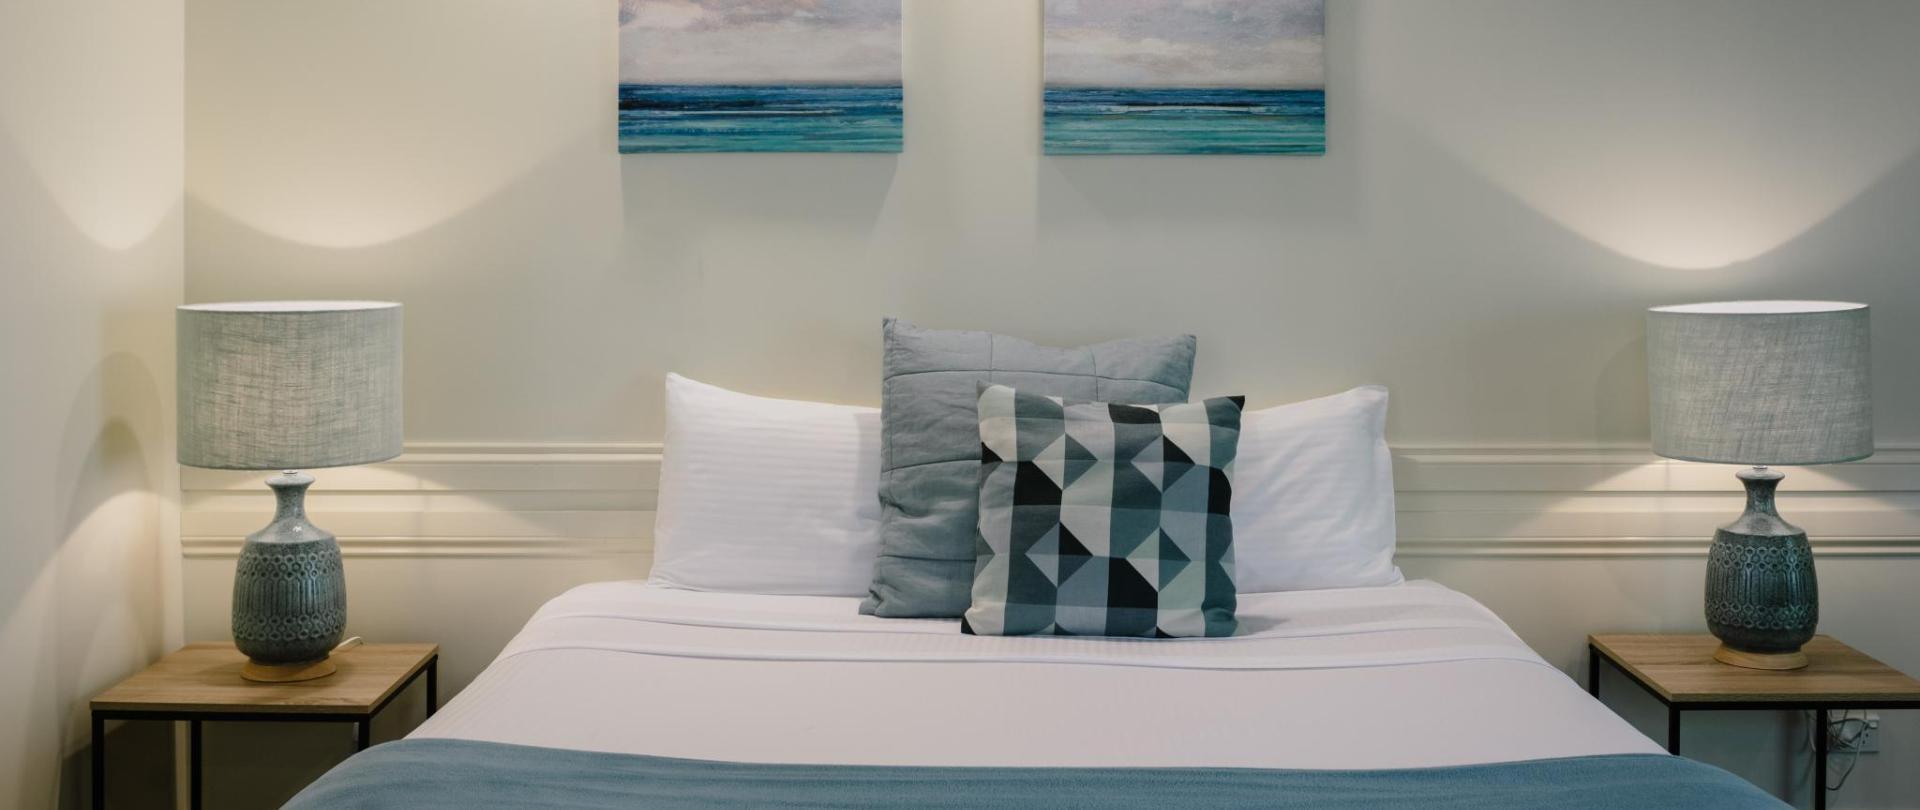 King bed 2.jpg